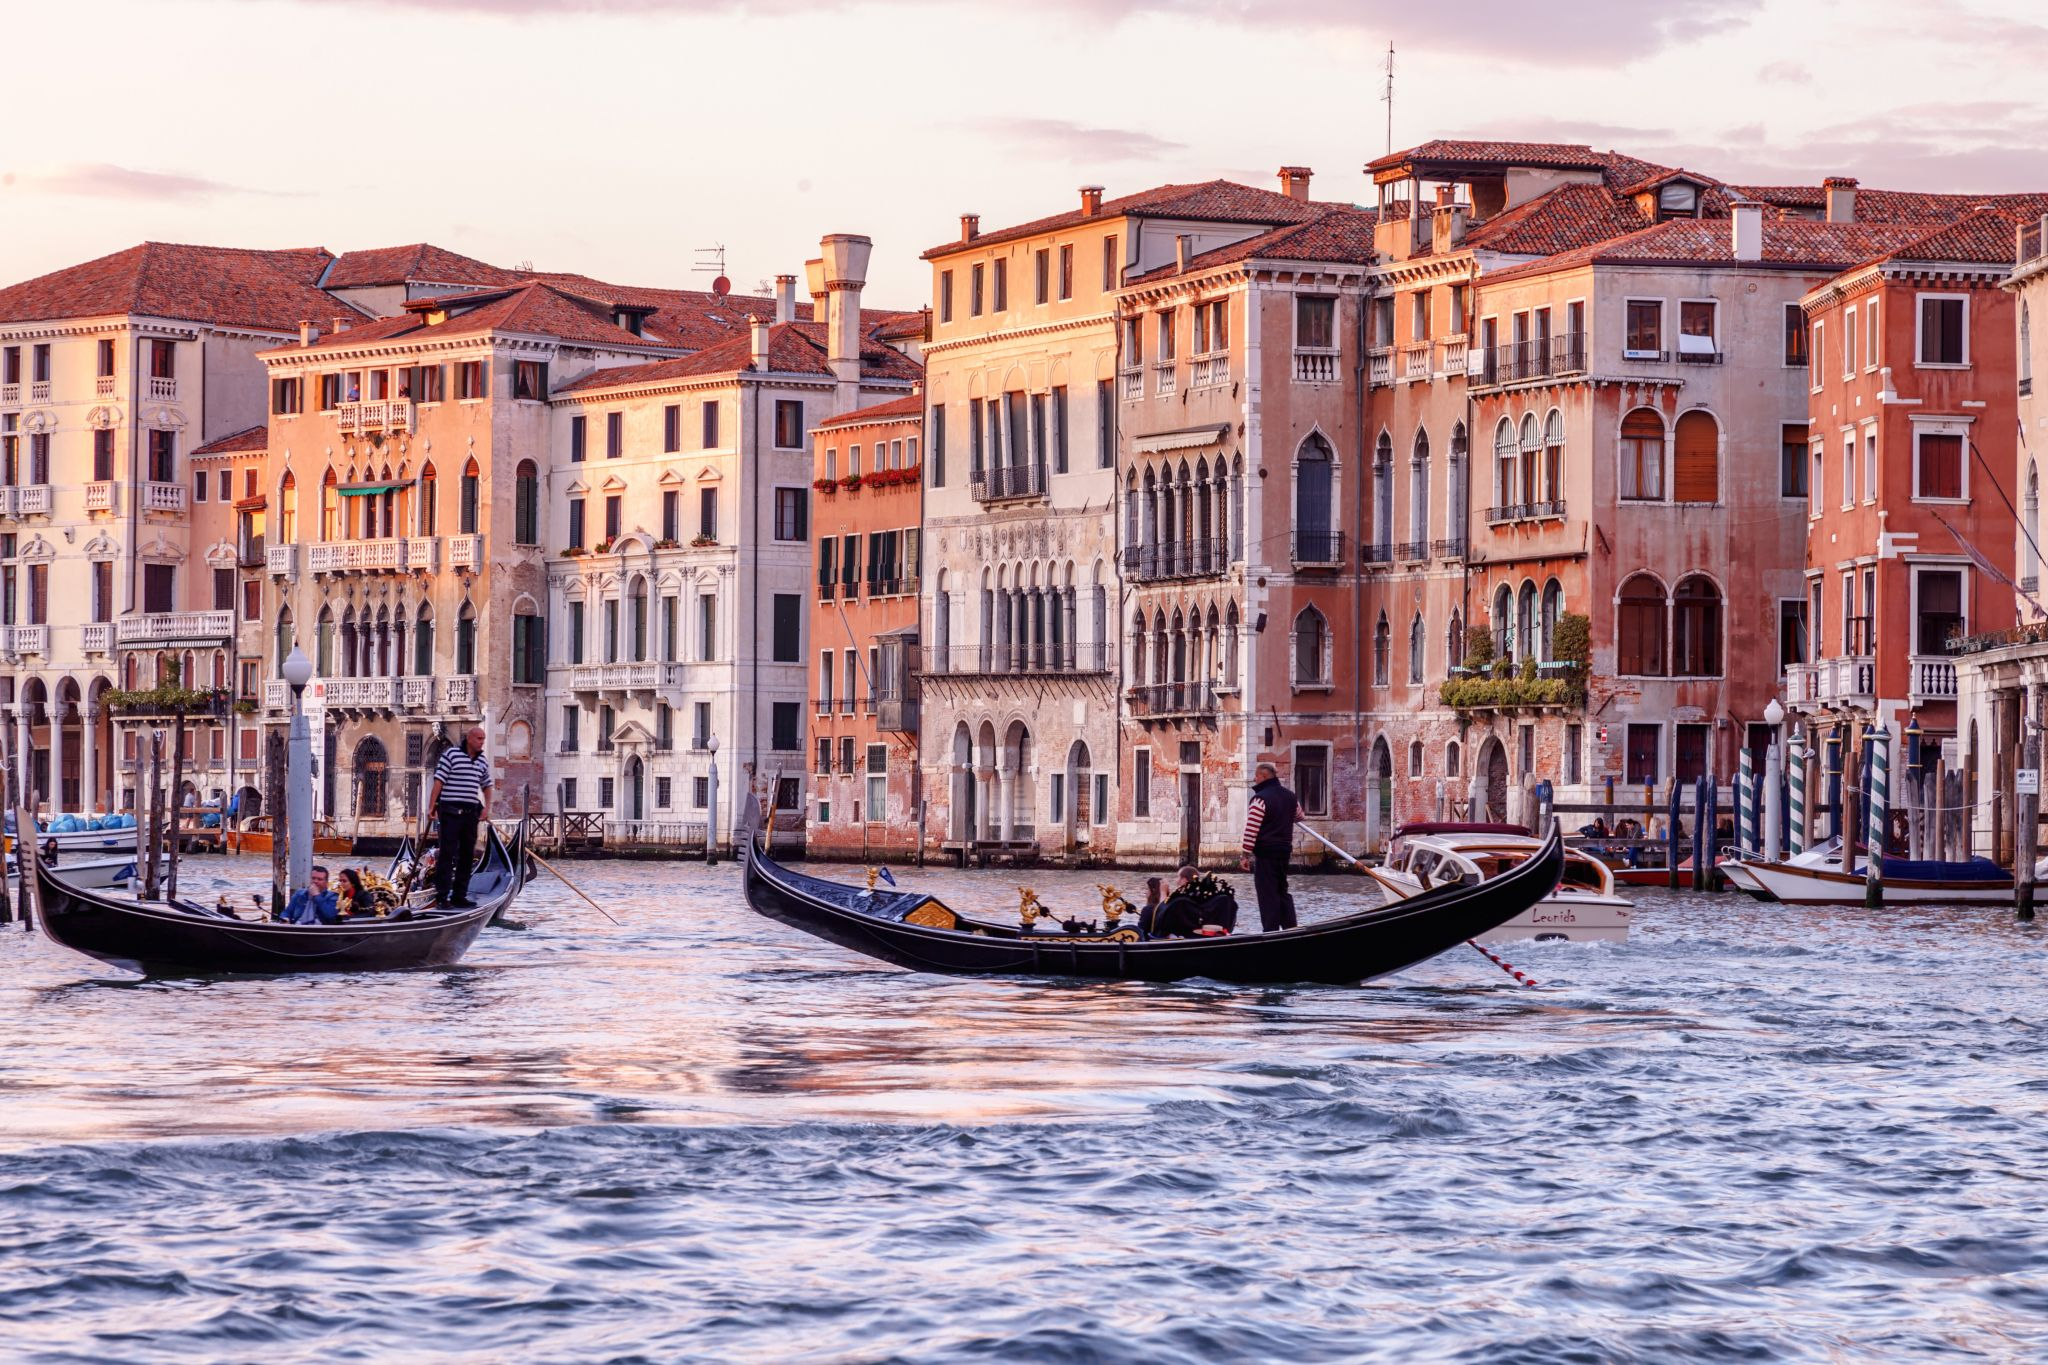 Venice - Al Buso, Italy